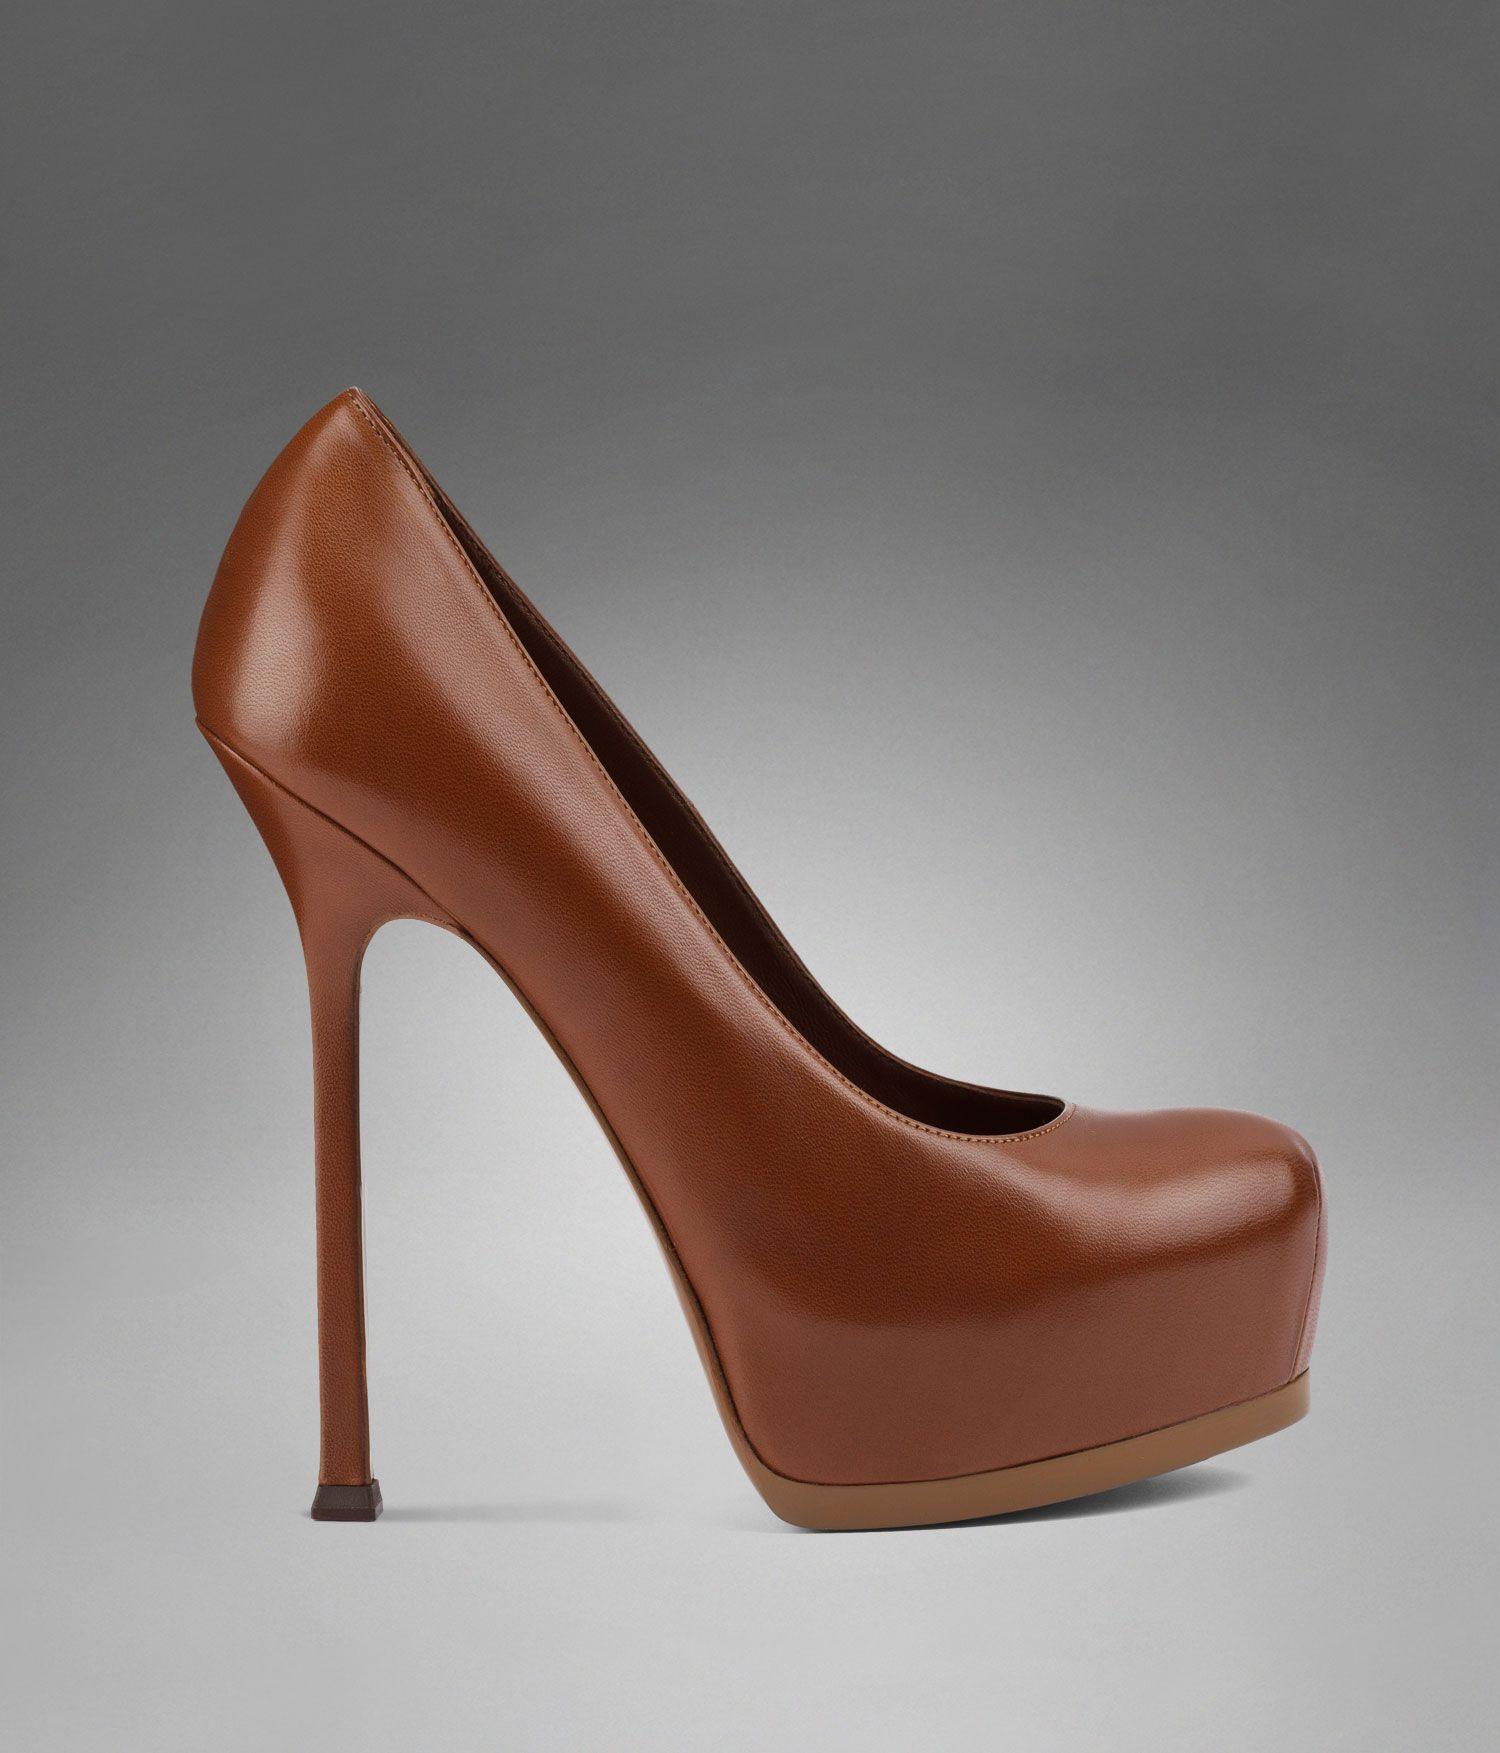 e2c2e0eeb3b YSL Trib Too High Heel Pump in Cognac Leather - Pumps – Shoes – Women – Yves  Saint Laurent – www.ysl.com